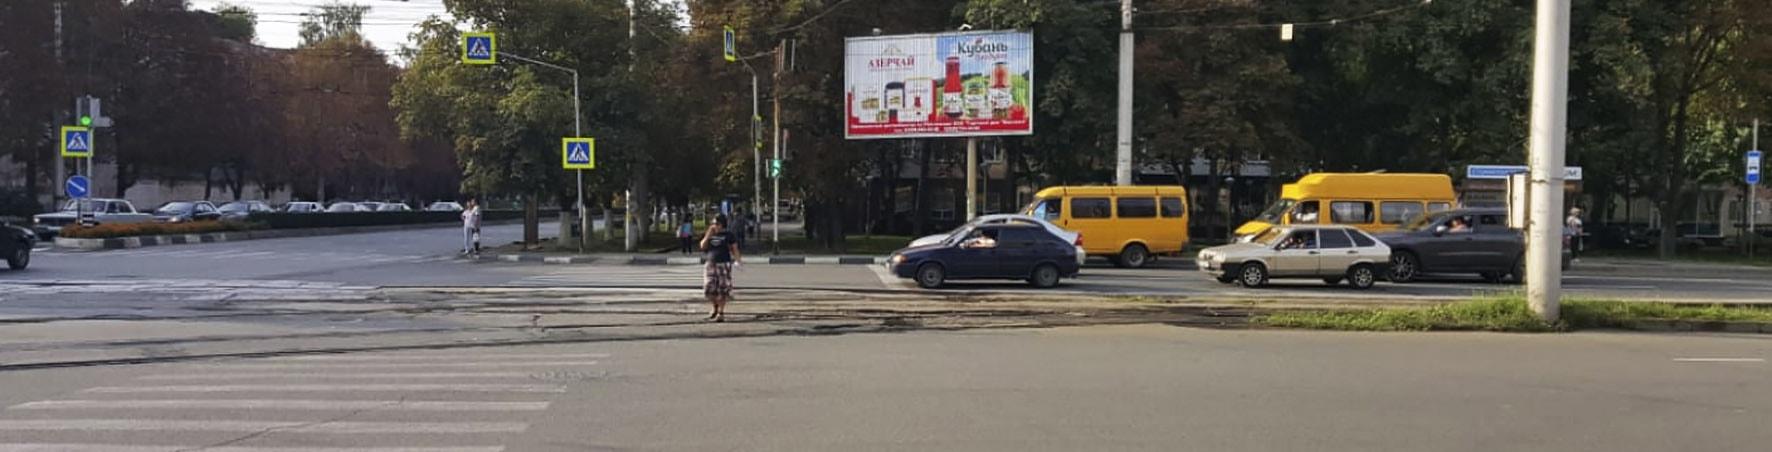 Реклама на щитах 3х6 в Владикавказе Осетия